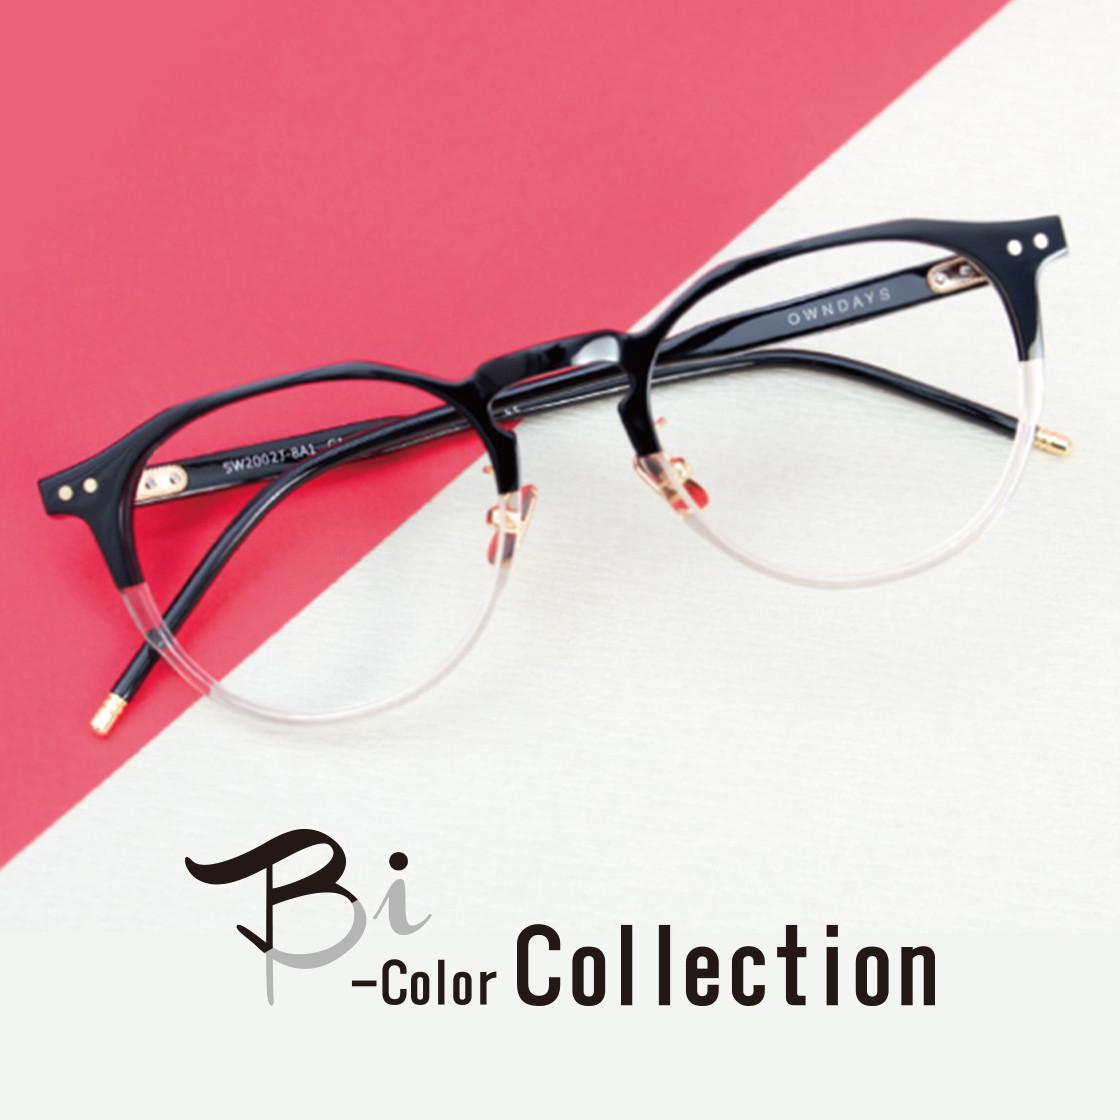 Bi-Color Collection(バイカラーコレクション)